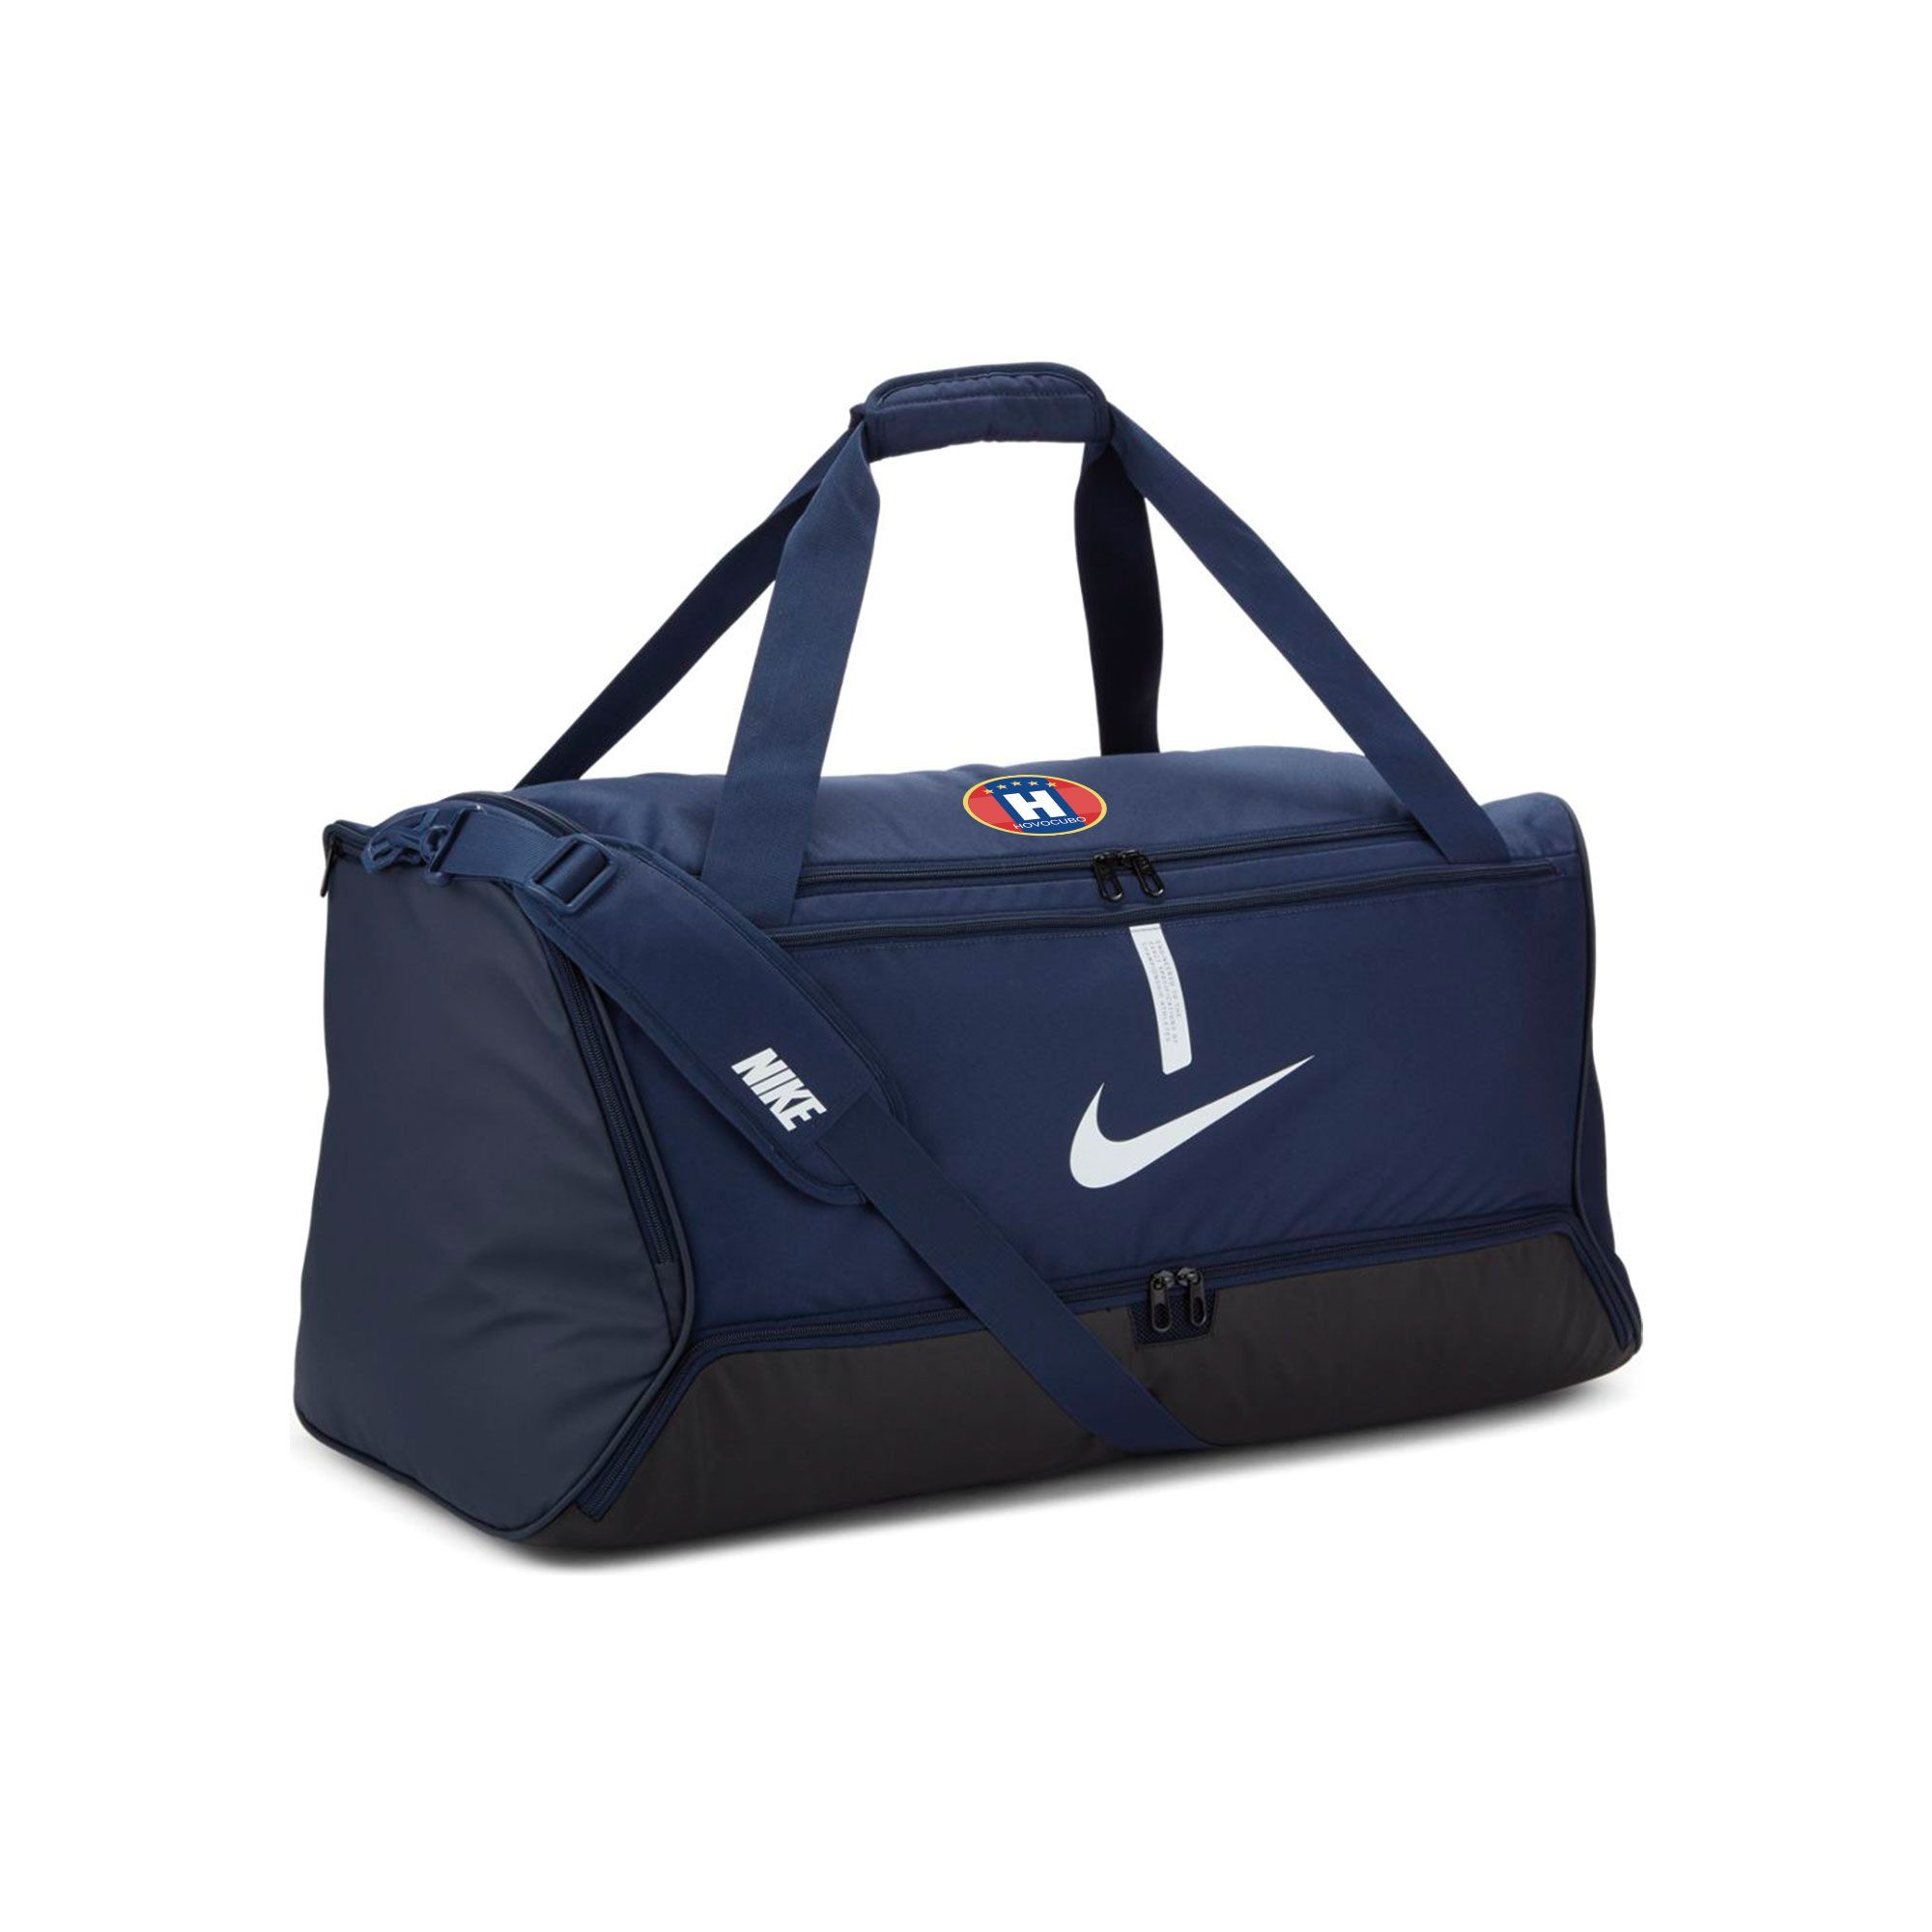 Hovocubo Academy Team L Duffel Bag